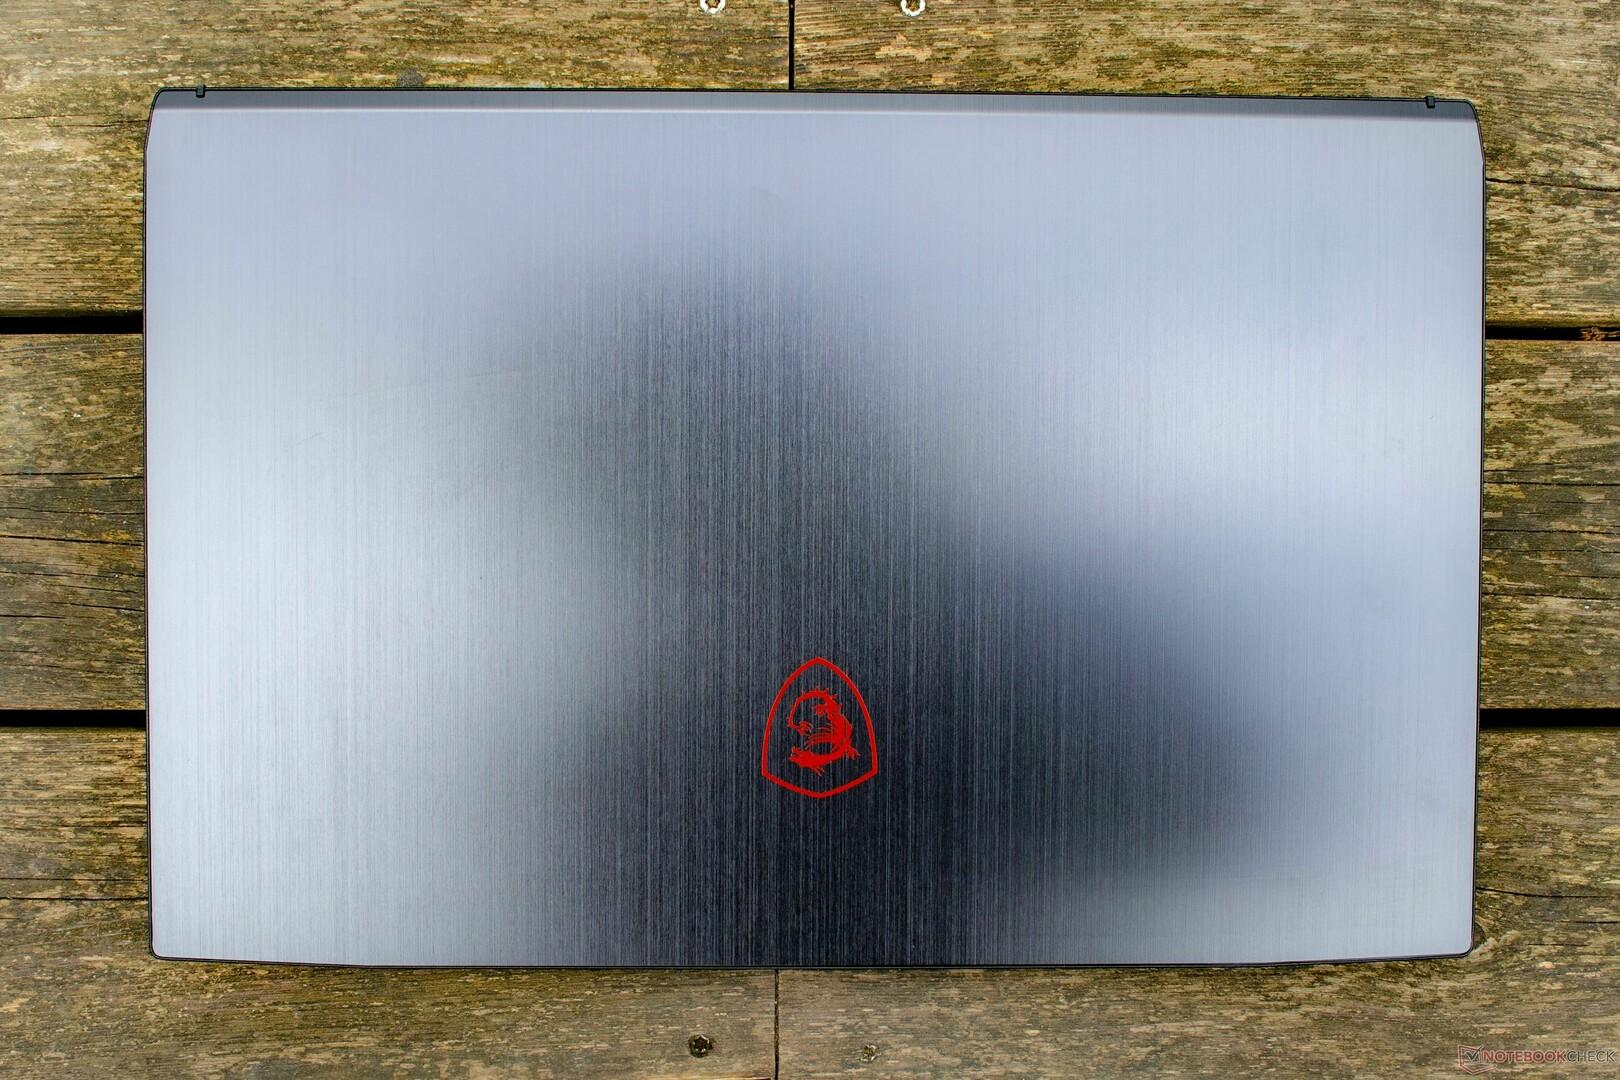 MSI GF75 Thin 8RD (i7-8750H, GTX 1050Ti Max-Q) Laptop Review